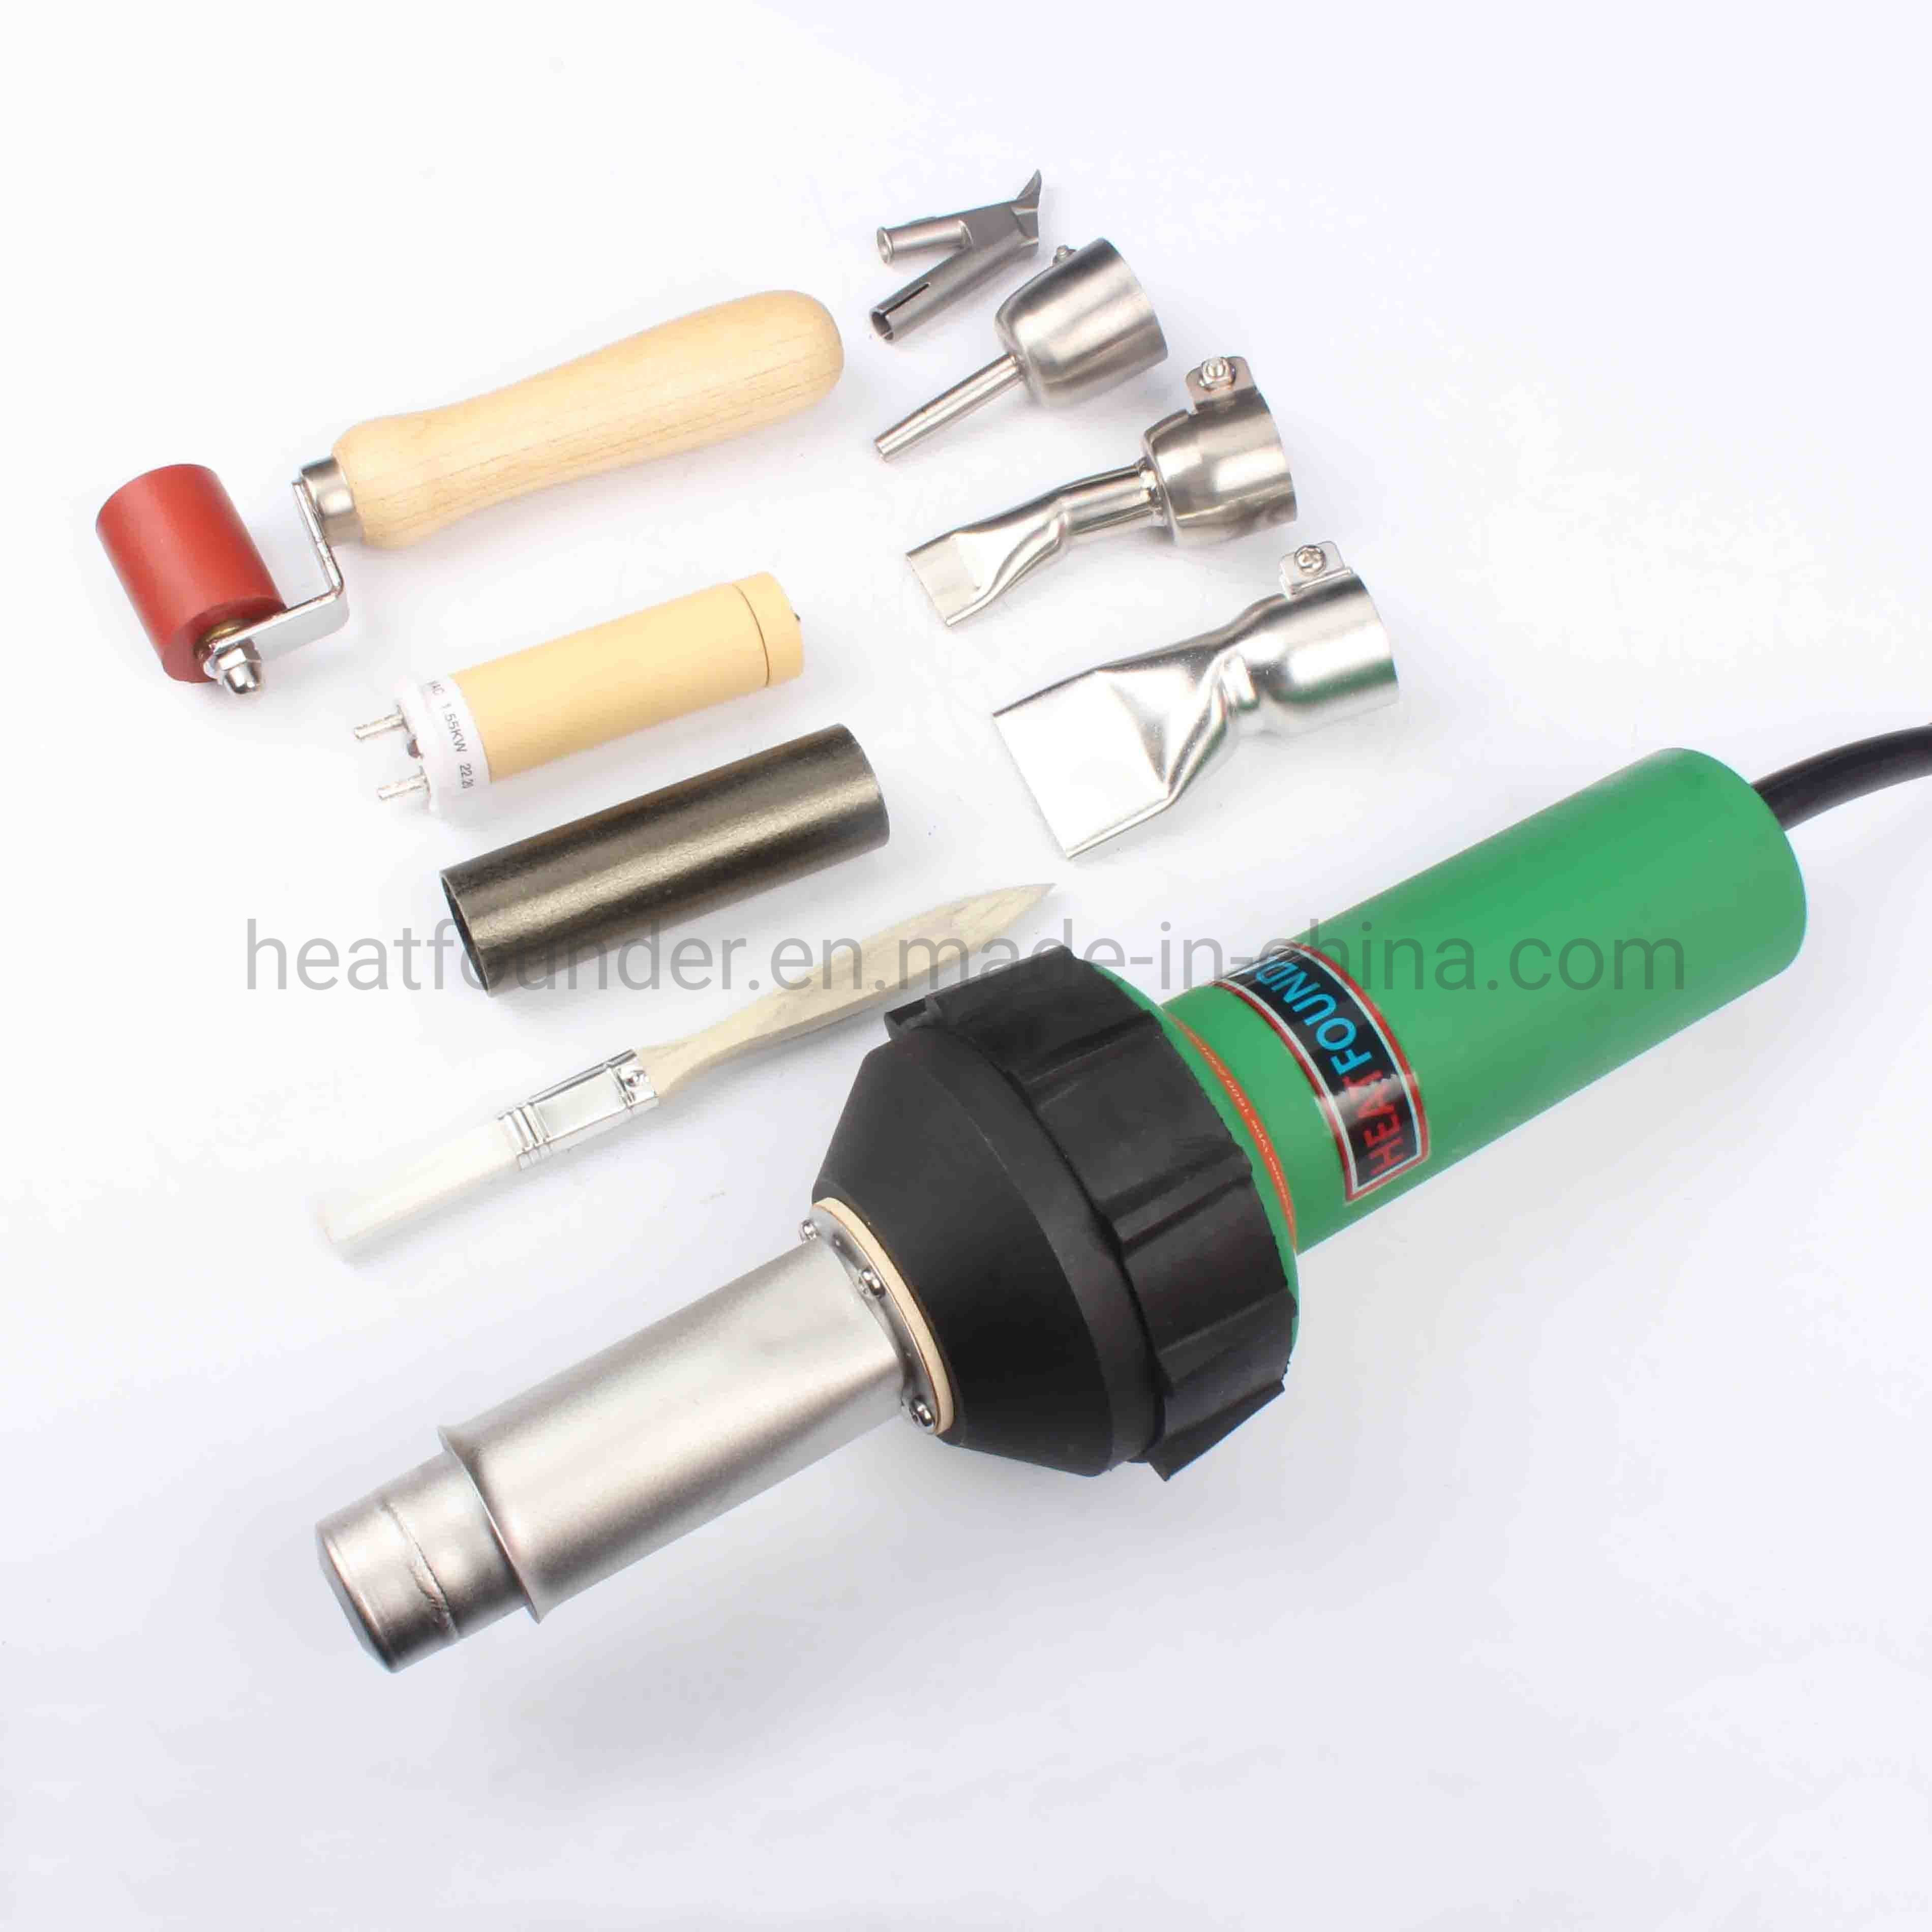 China 1600w Portable Hot Air Blower Hot Air Plastic Welding Gun For Banner Tarpaulin Geomembrane Repairing Patching Welding China Welding Gun Pvc Welder